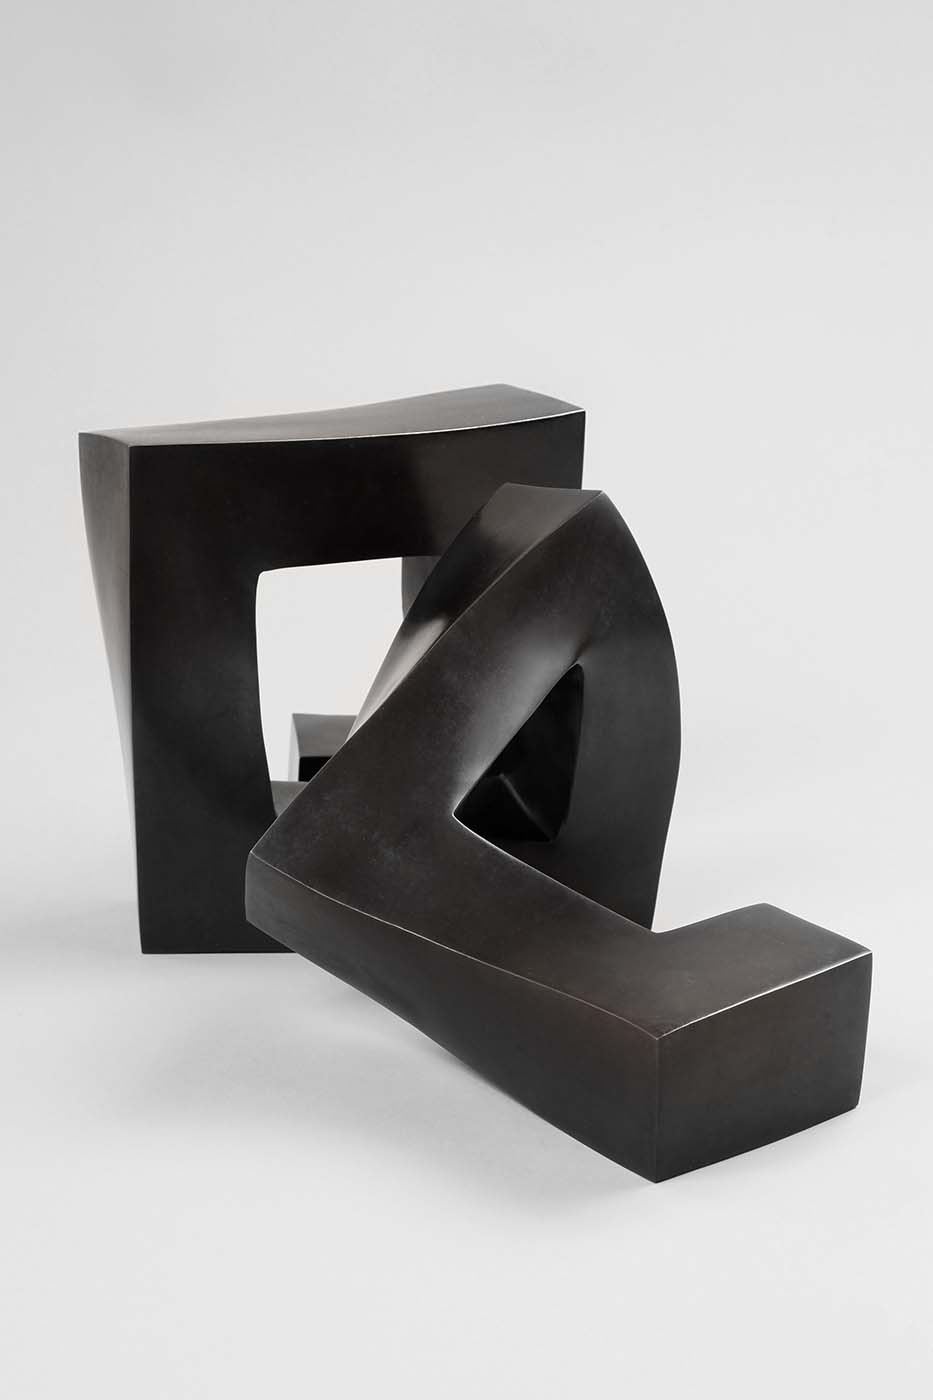 Zerreißprobe, 2010, Bronze, 19 x 19 x 35 cm (01)